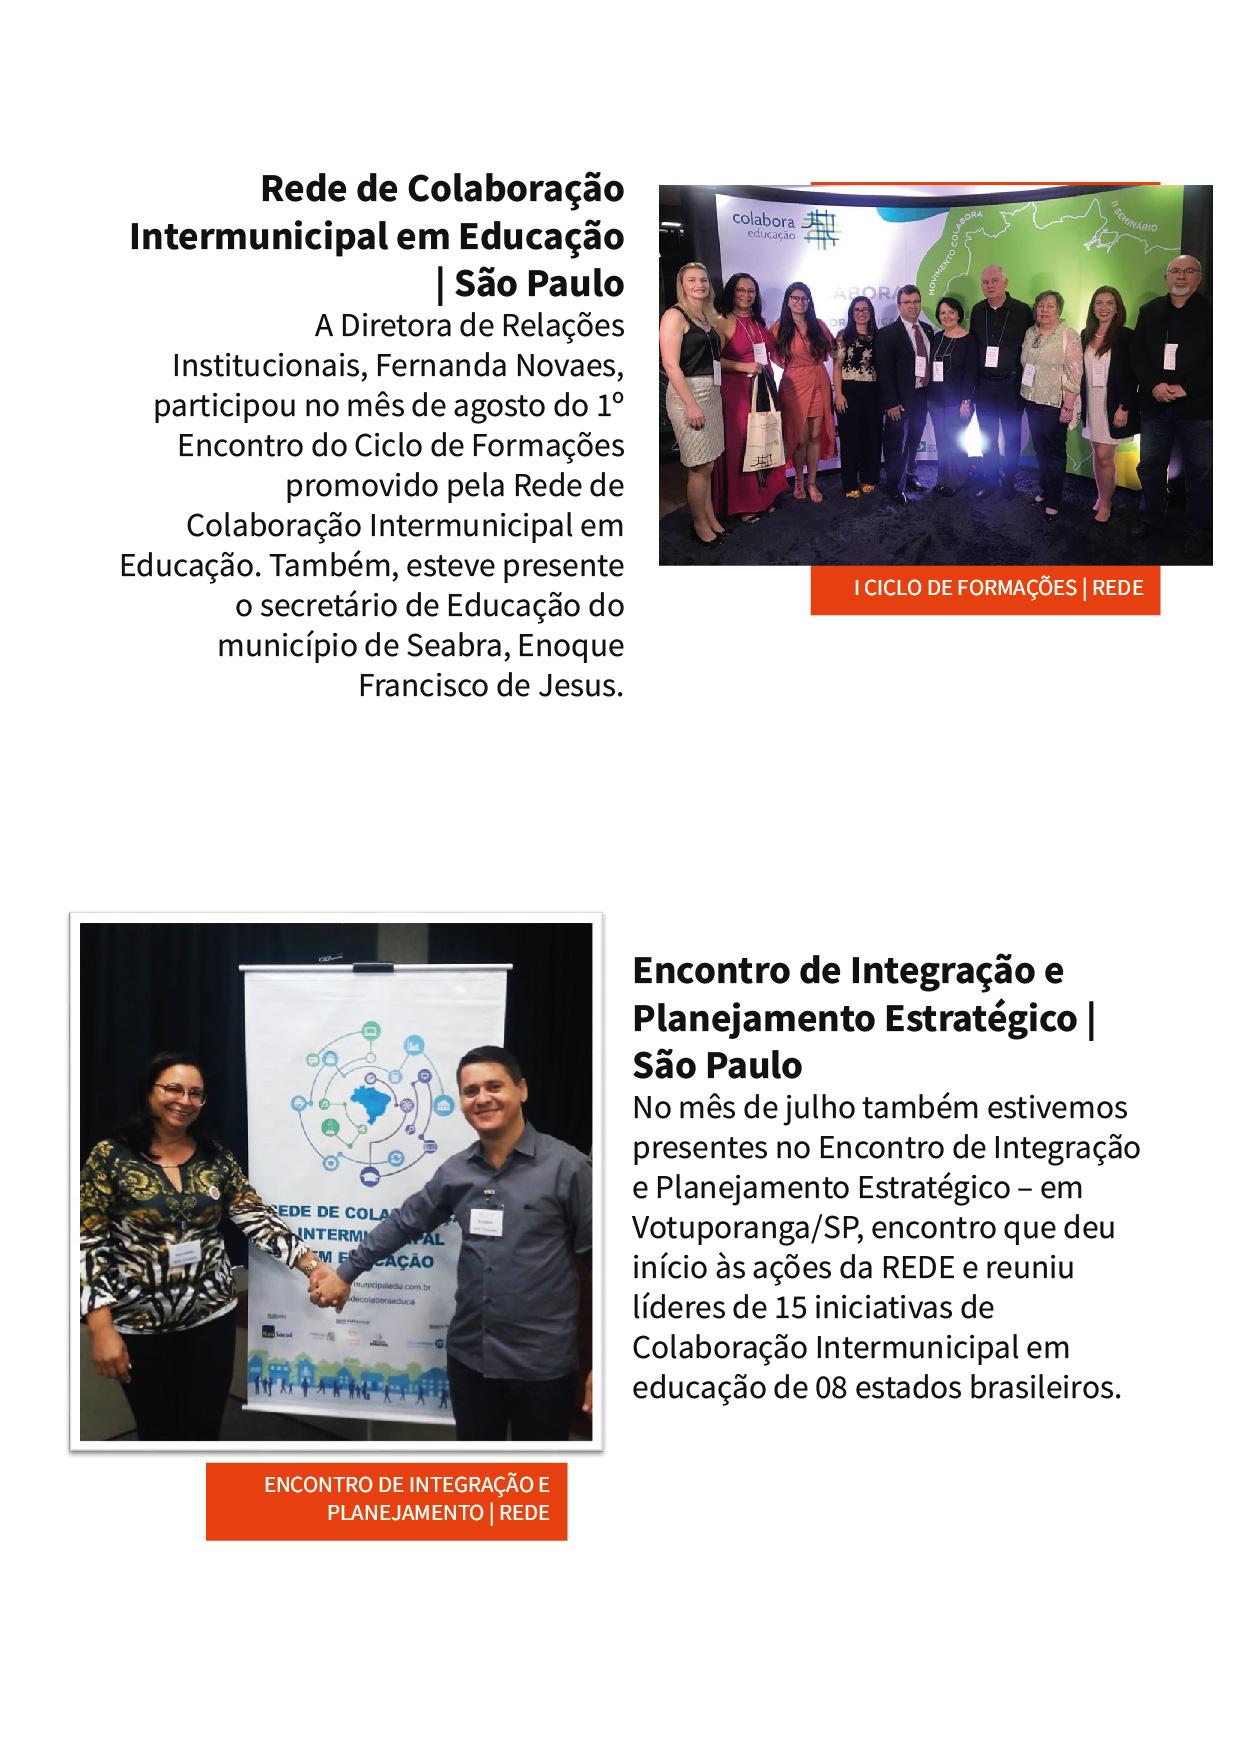 ICEP - Boletim edição 2, versão impressa_Fundo copy 11